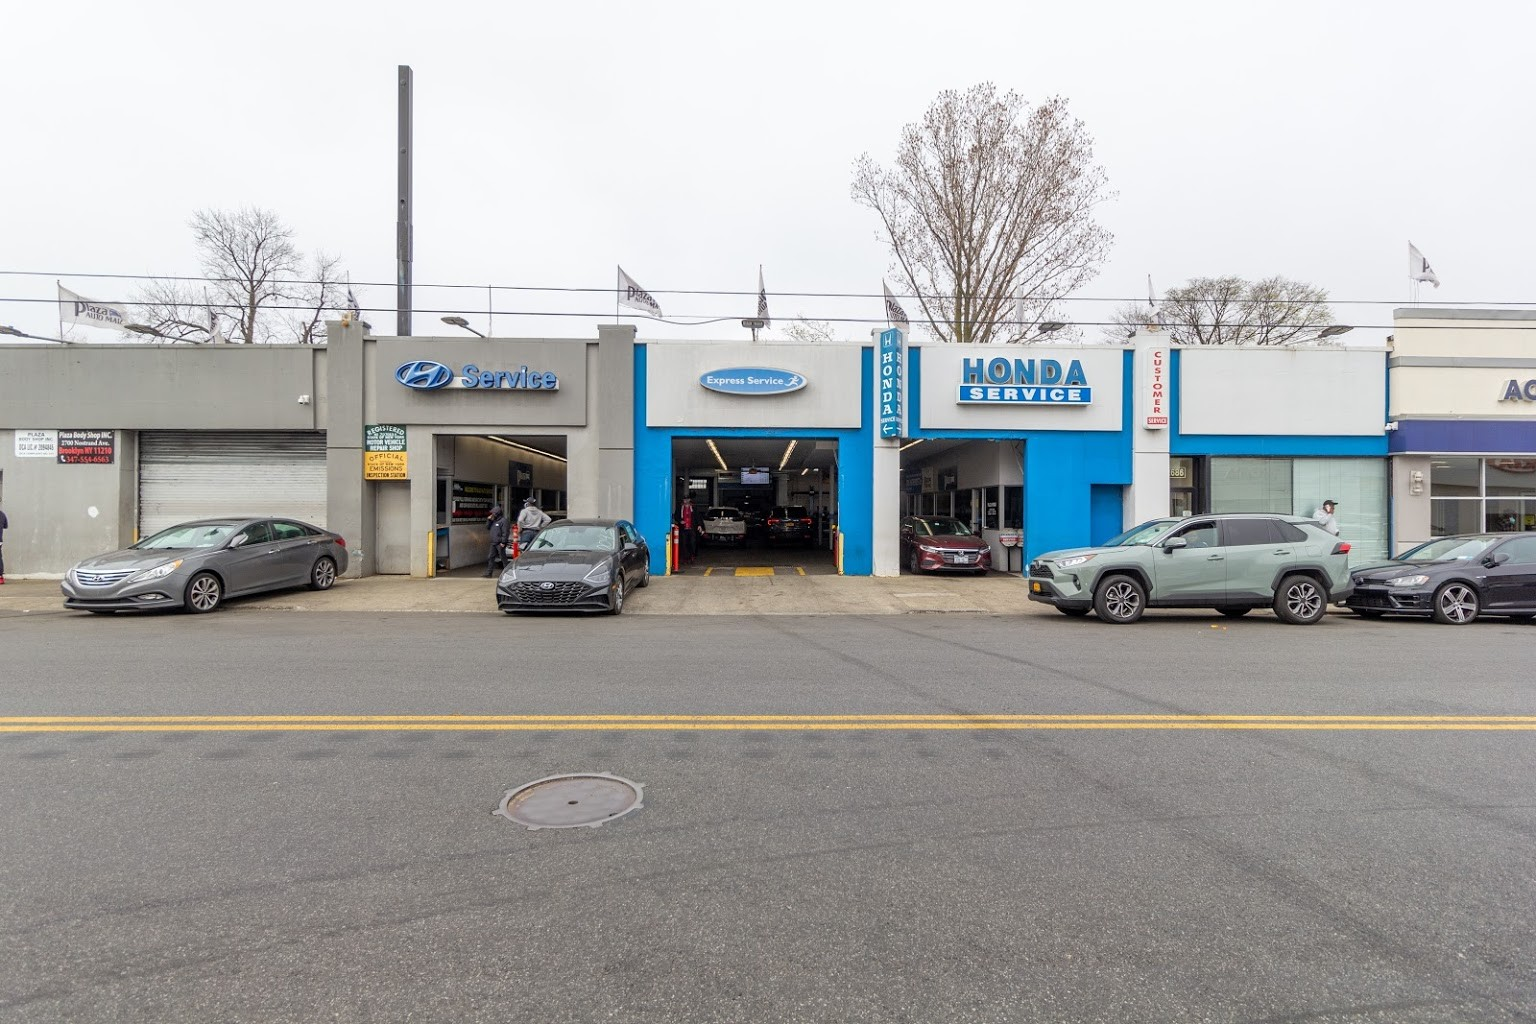 Plaza Auto Mall Hyundai Service car repair shop in Brooklyn, NYC